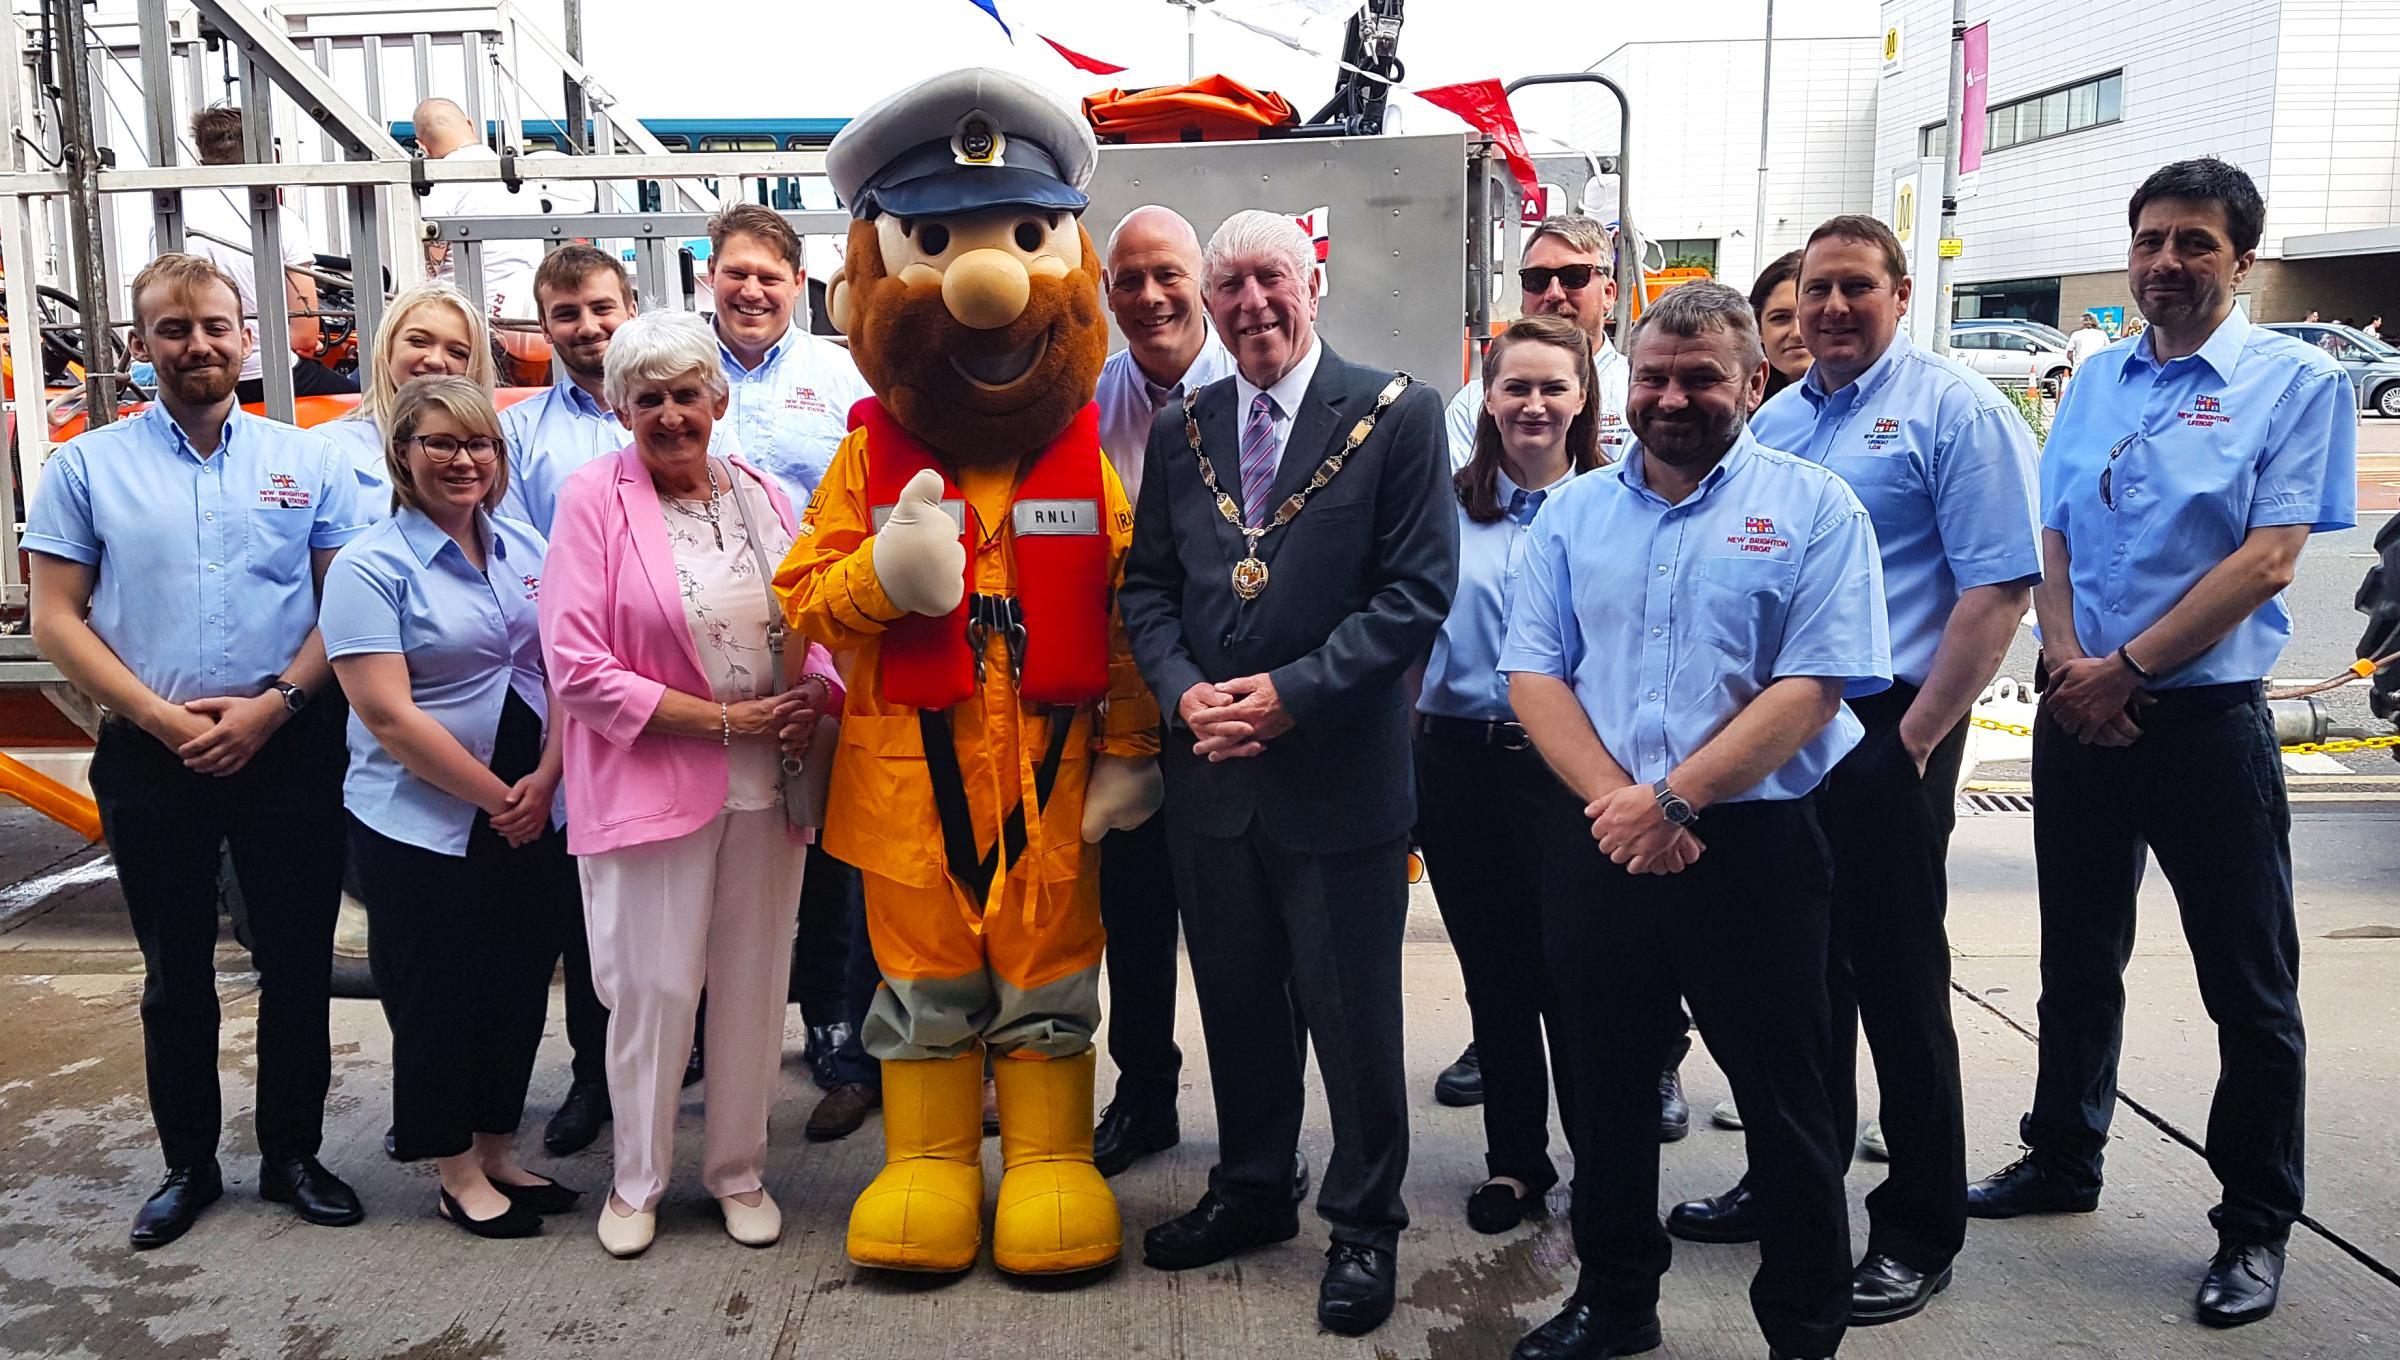 Record-breaking family day raises £3,500 for RNLI New Brighton